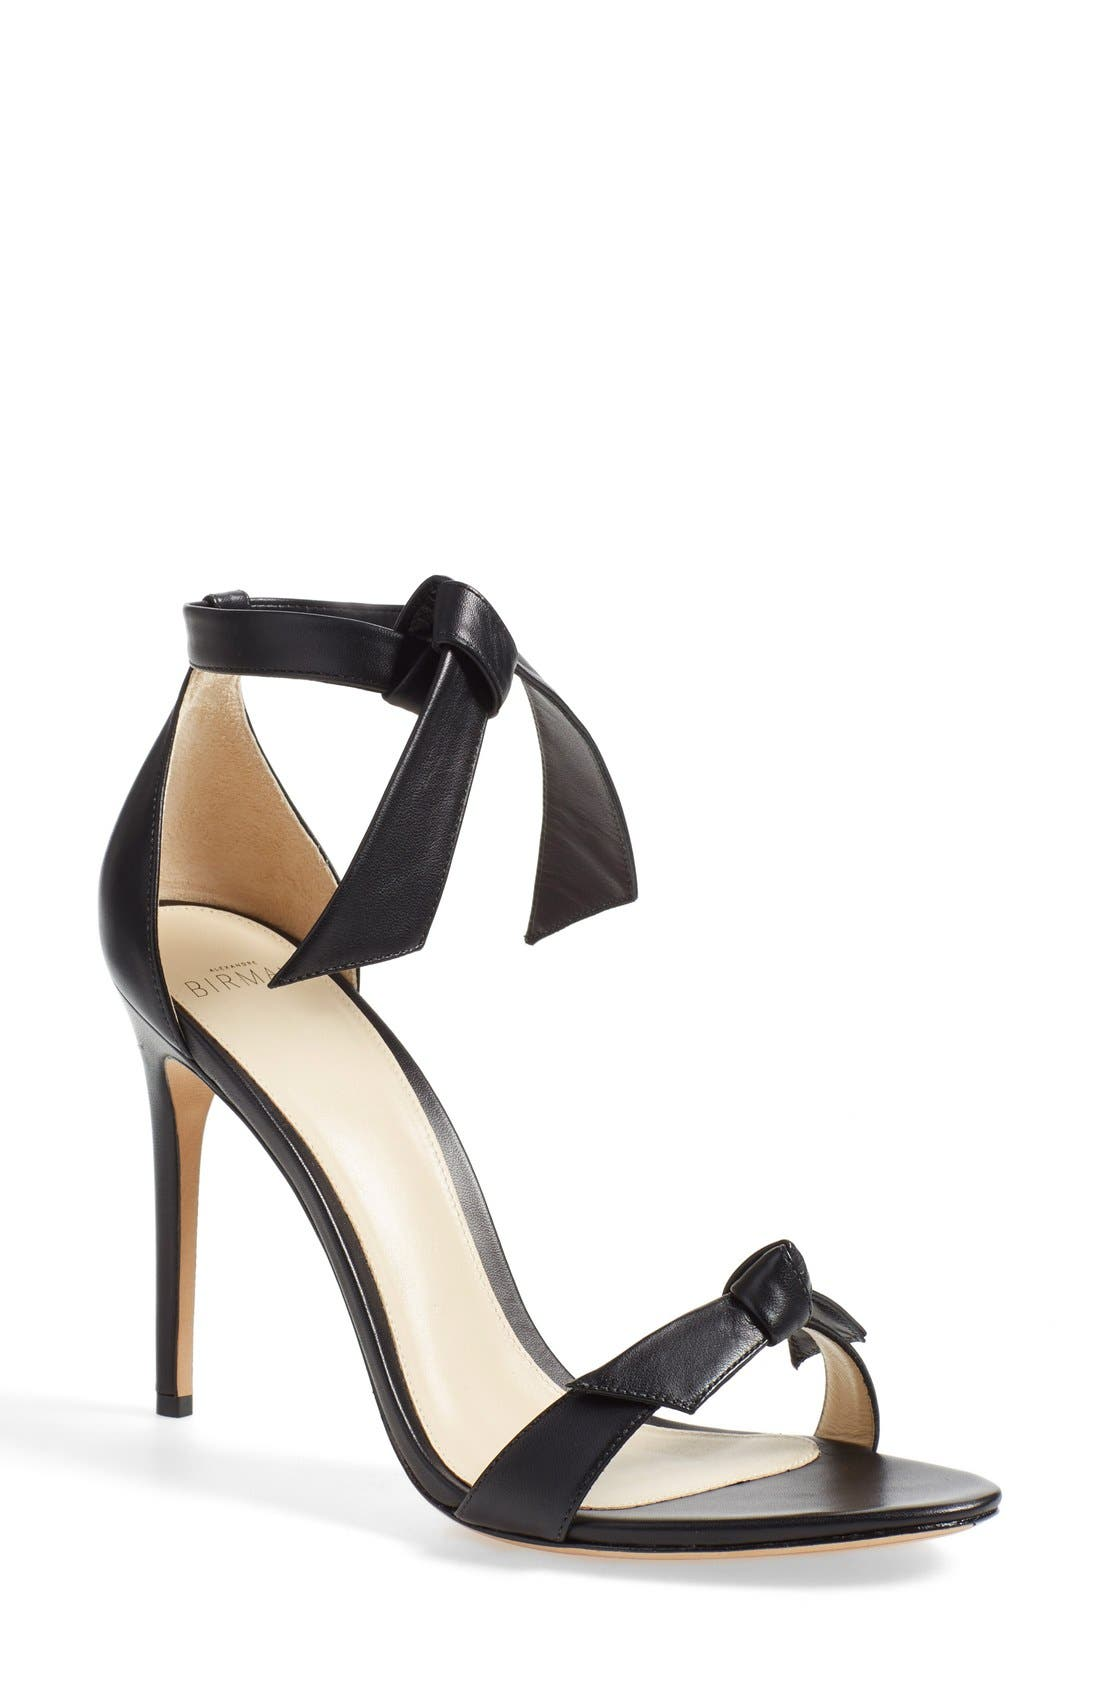 ALEXANDRE BIRMAN 'Clarita' Ankle Tie Sandal, Main, color, BLACK LEATHER